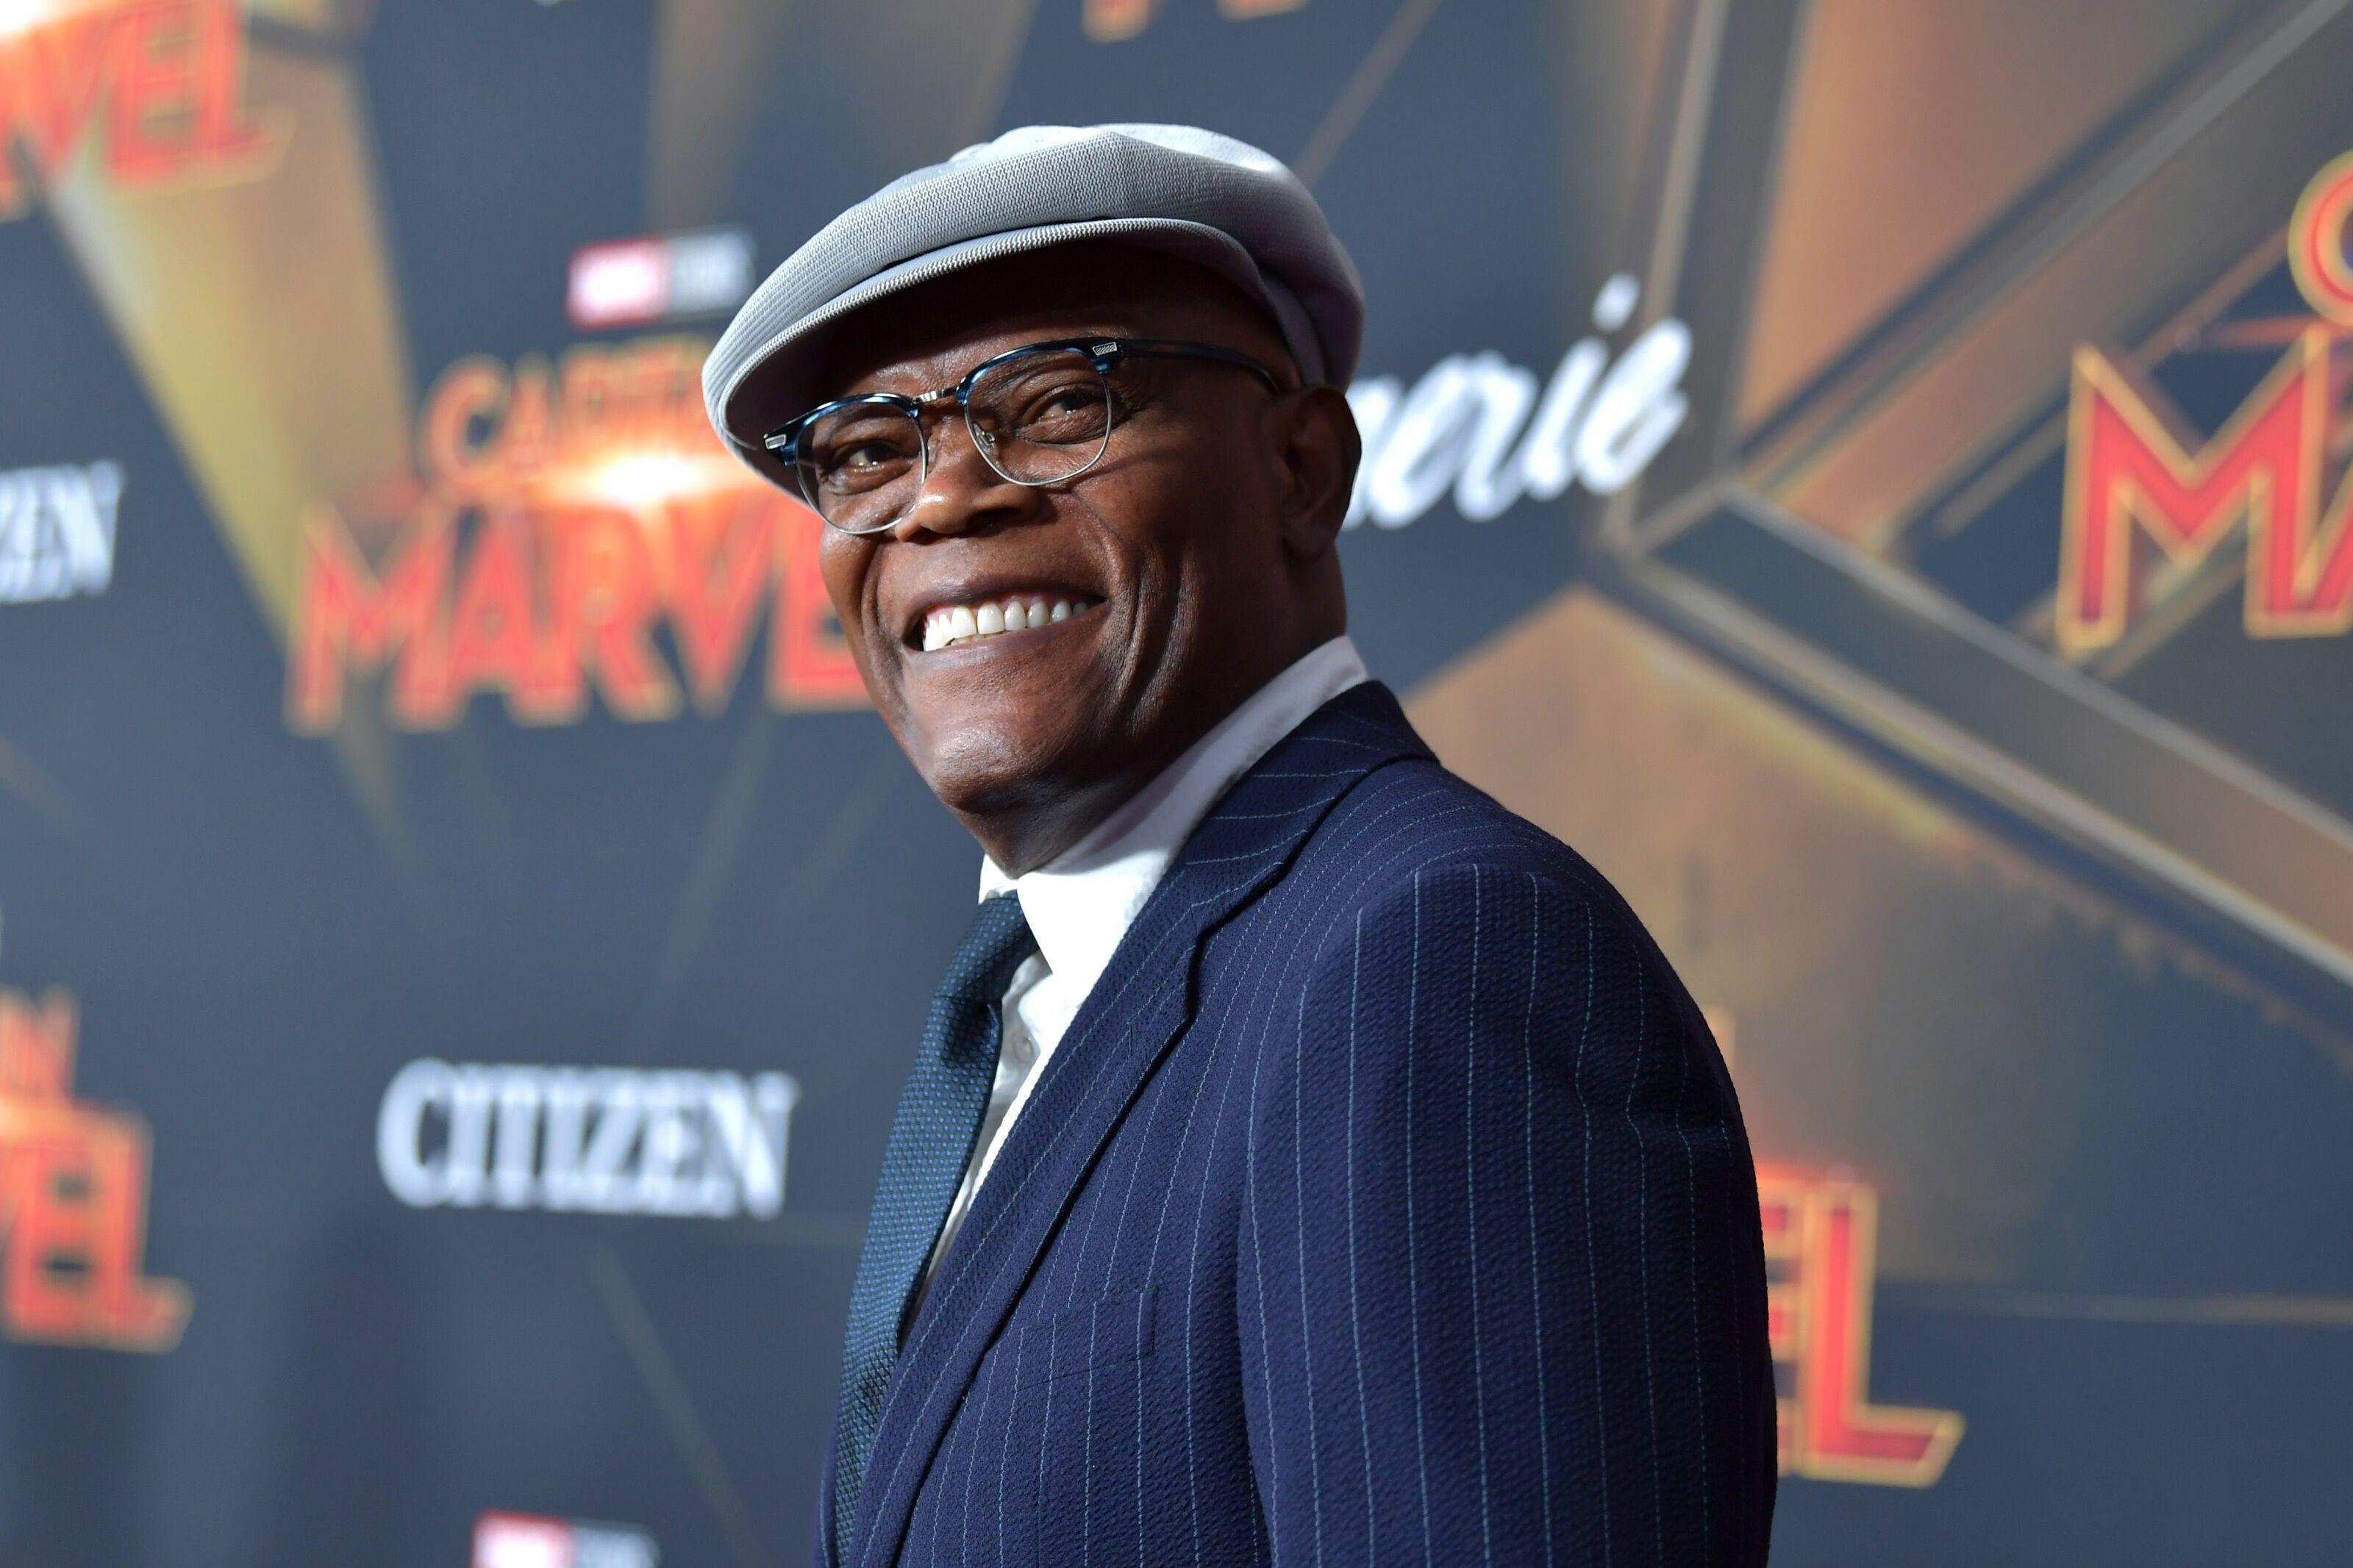 Samuel L. Jackson's response to Scorsese's superhero comments is spot on